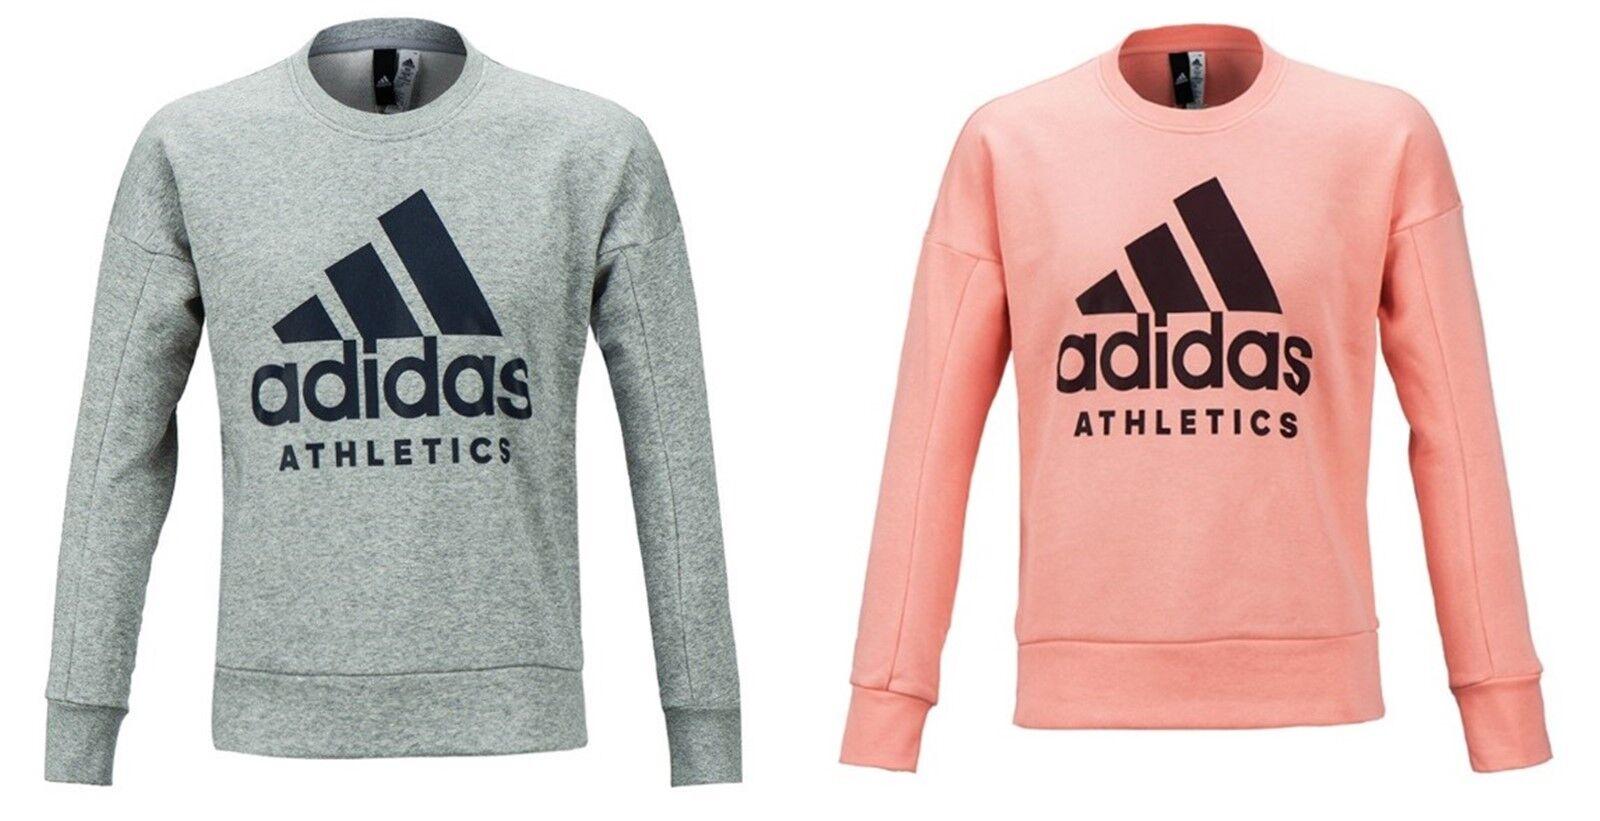 "Adidas ΓυναικΡία Αθλητικά ID L / S πουκάμισα Pinke Γκρι Ξ""ΞΉΟŒΞ³ΞΊΞ± Πουκάμισα GYM T-shirt Jersey B47325"